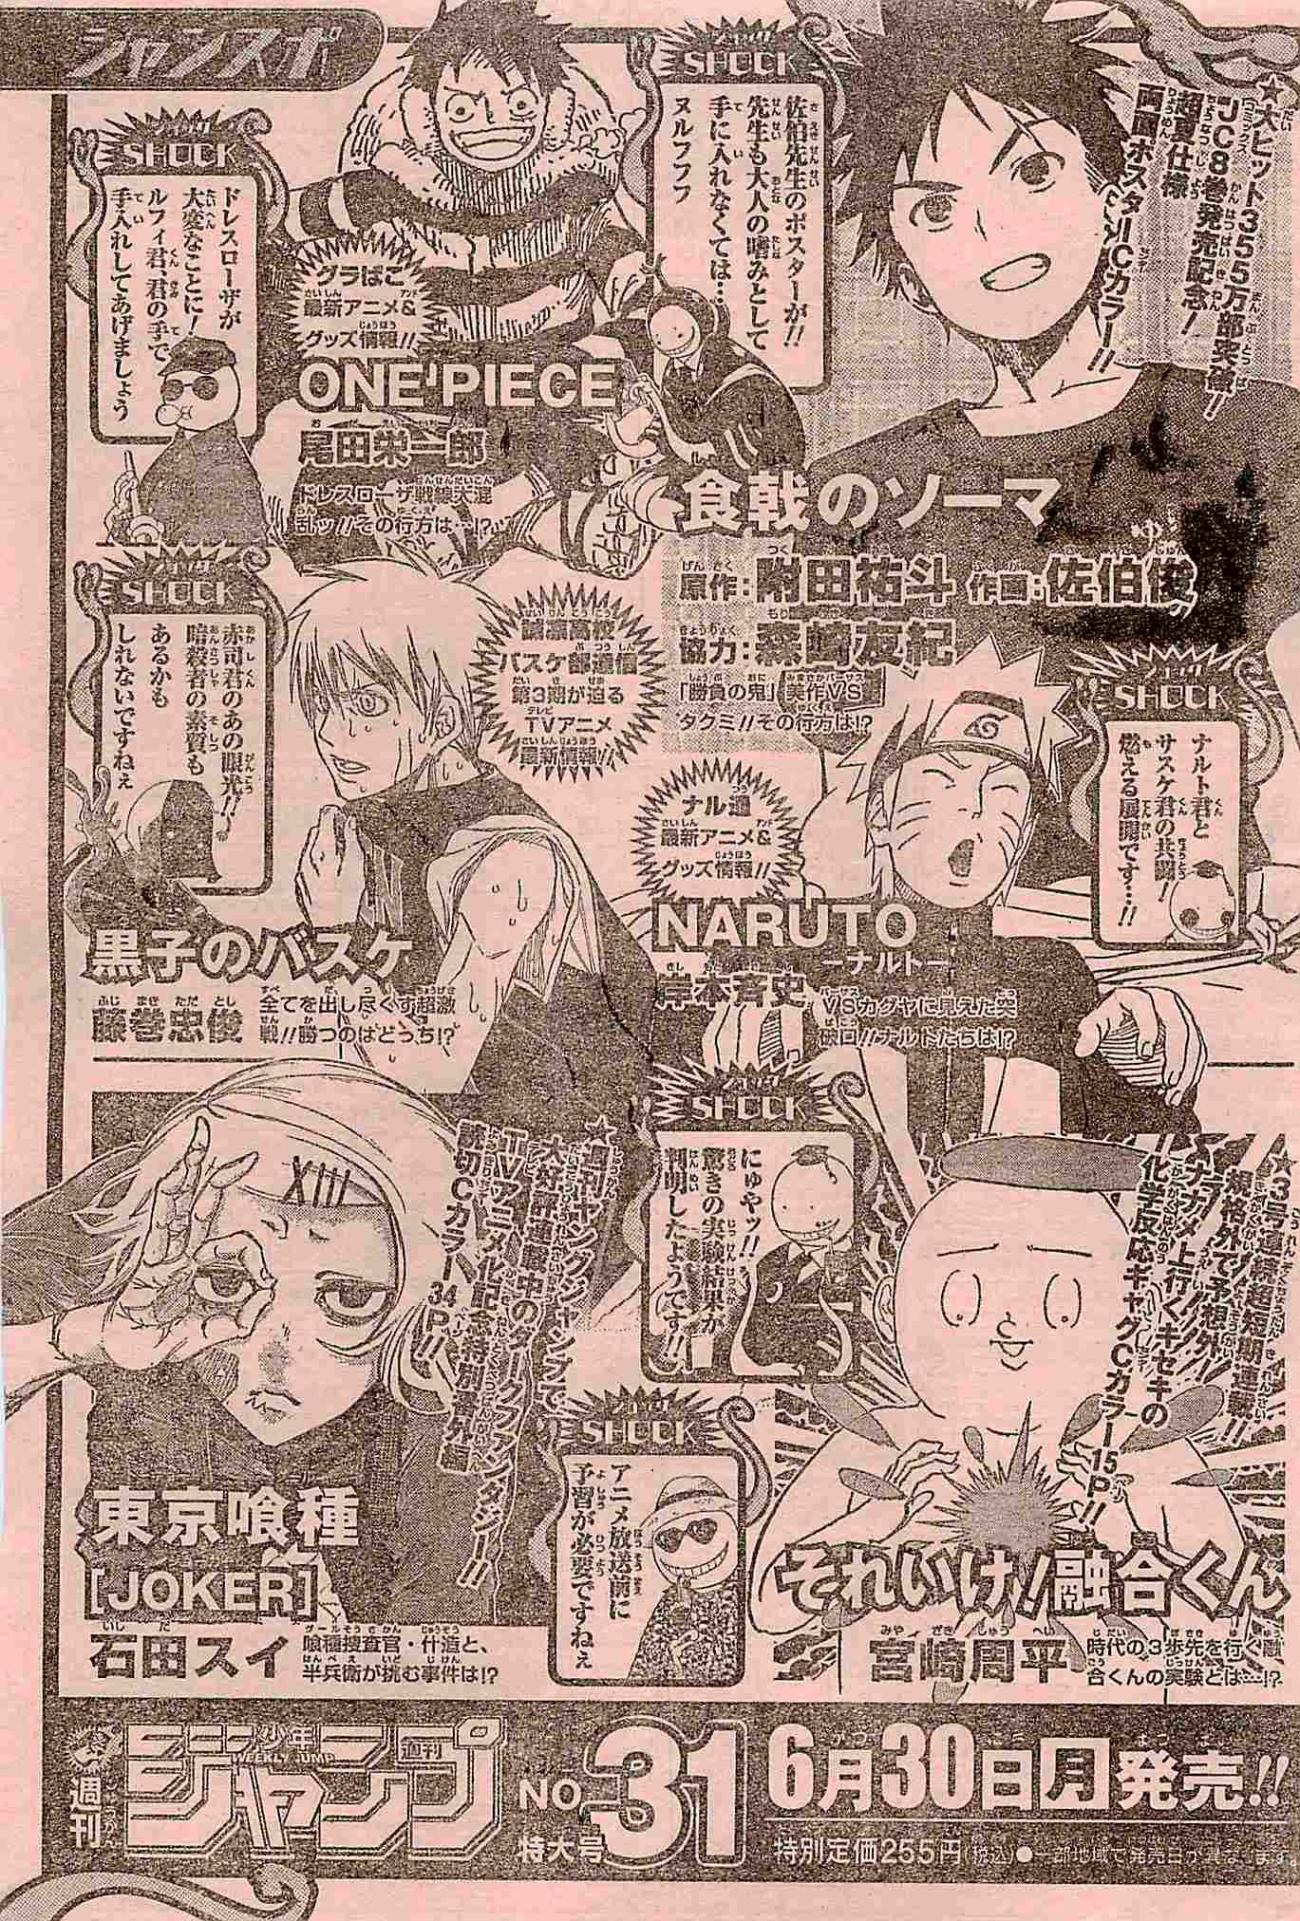 Dans Weekly Shonen Jump 2014 #31